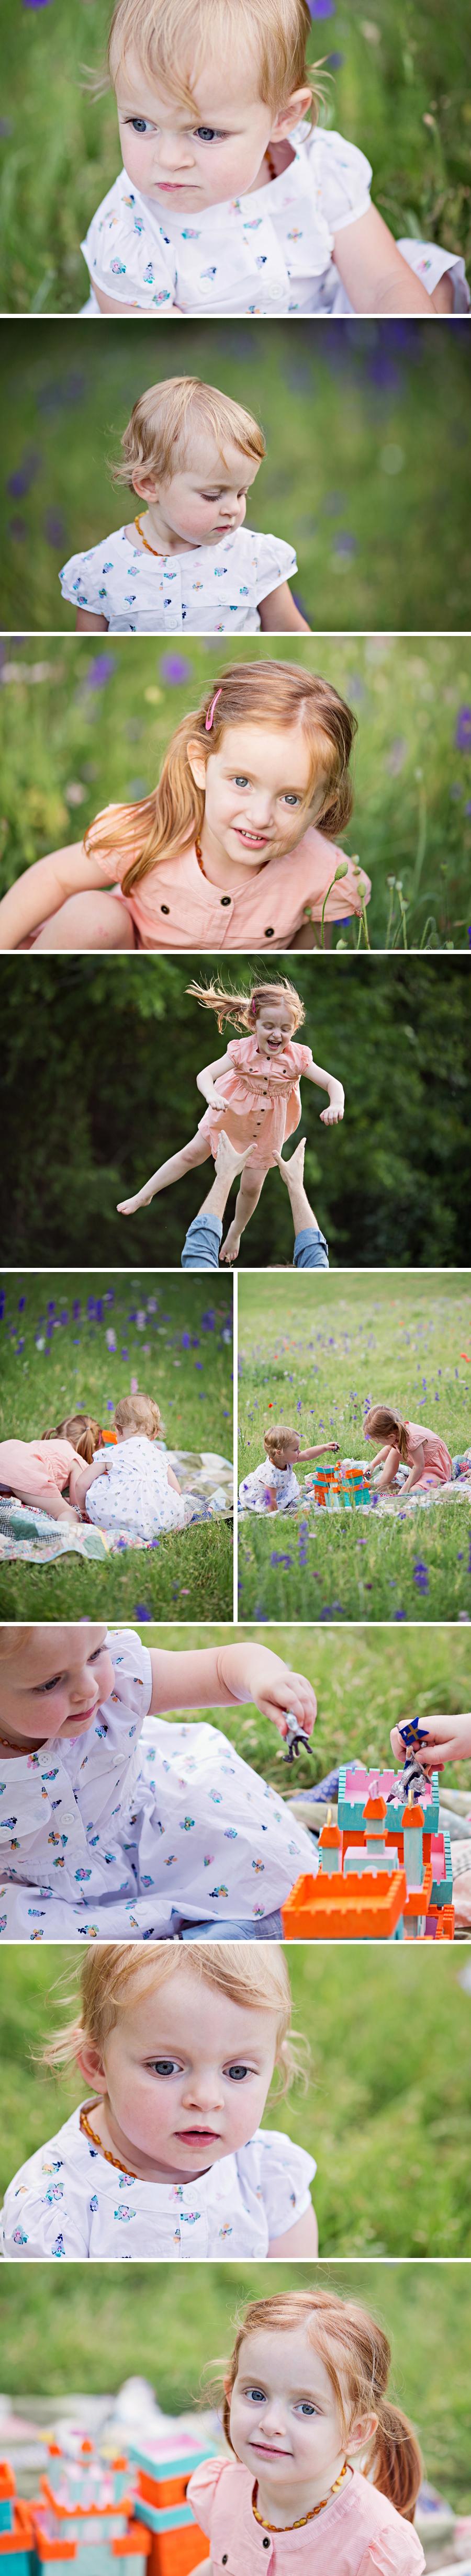 Dallas-Family-Photographer064